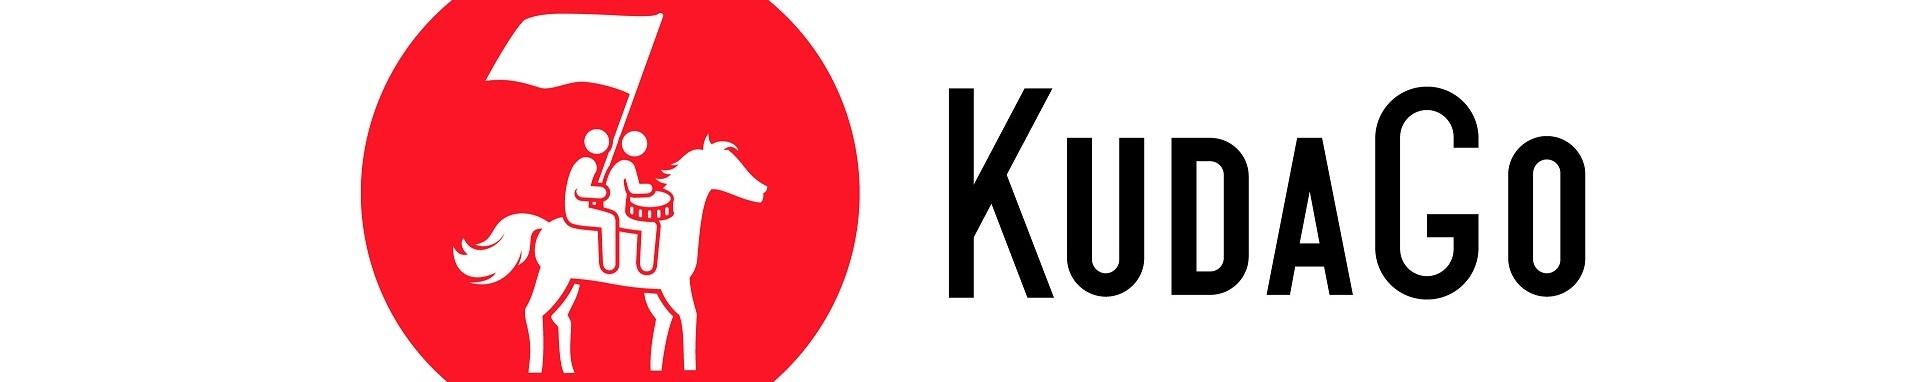 creator cover KudaGo